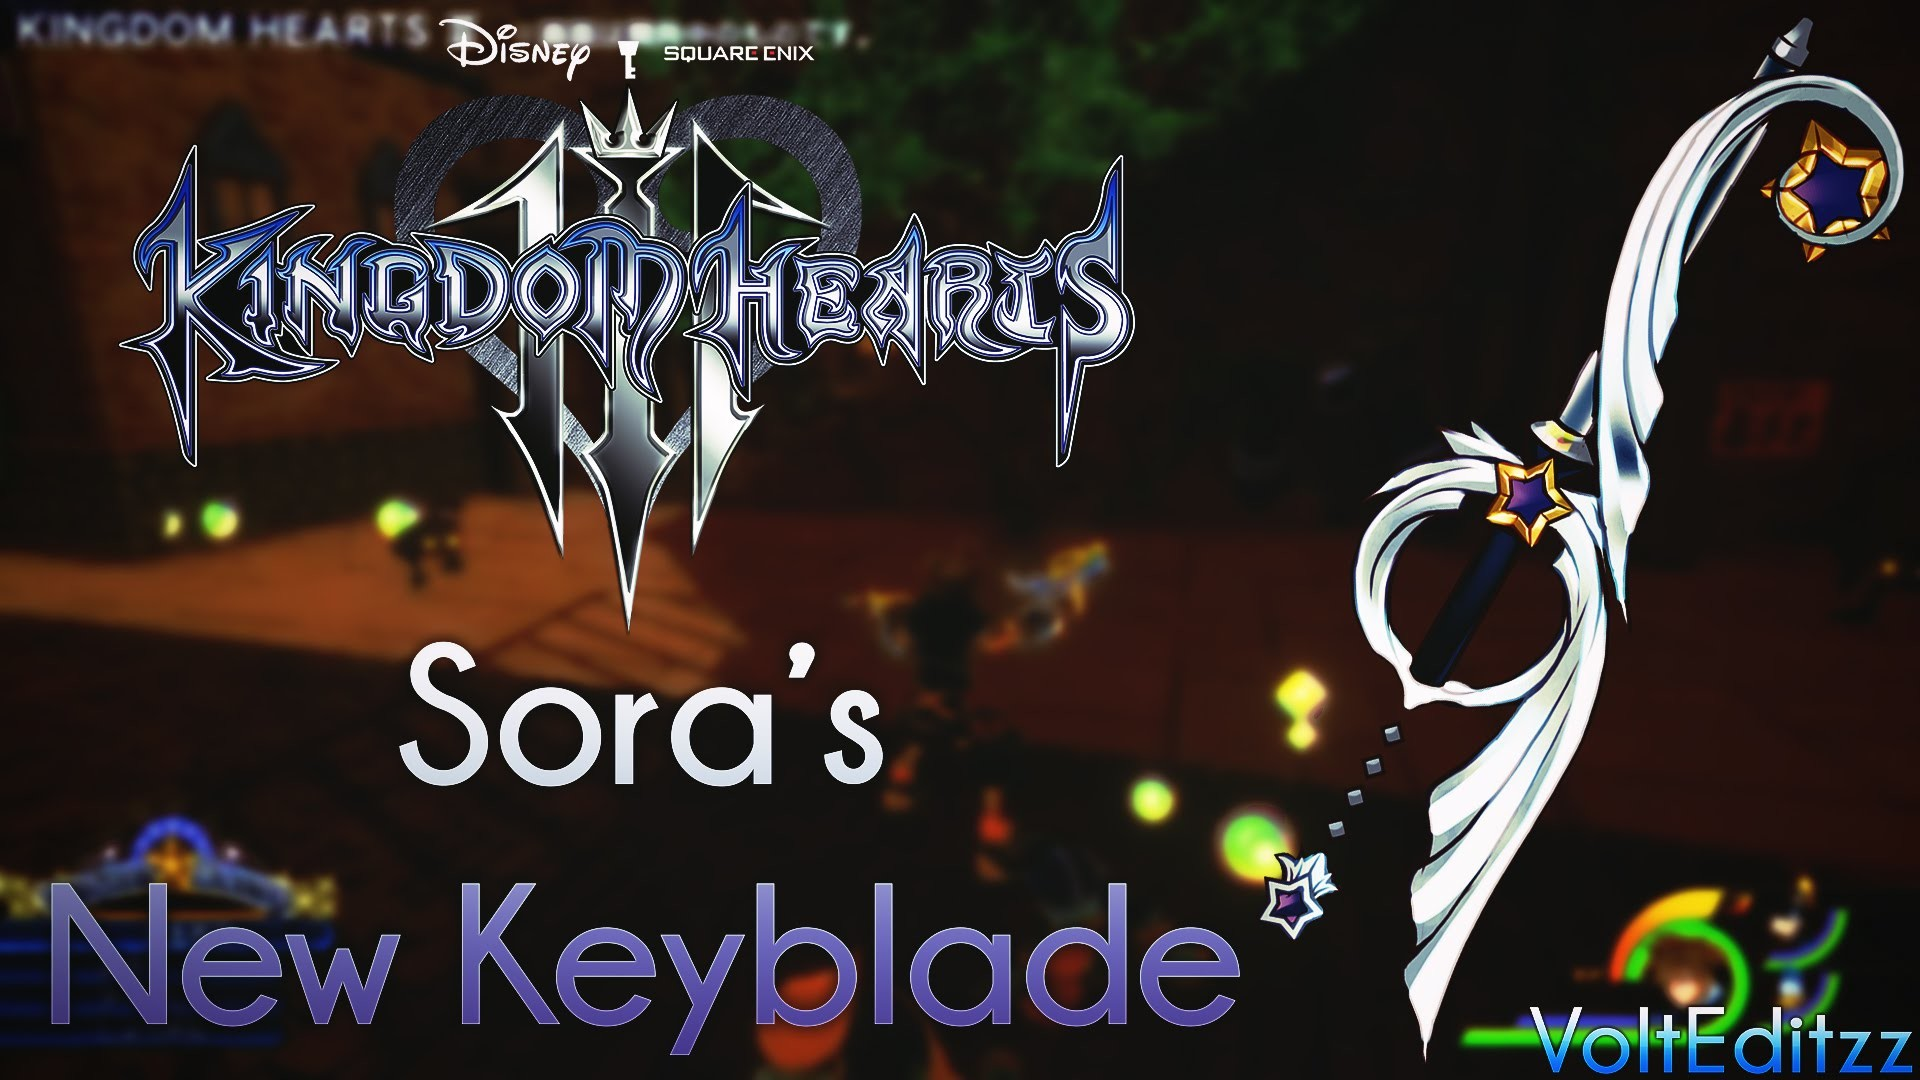 Kingdom Hearts Keyblade Wallpaper (74+ images)